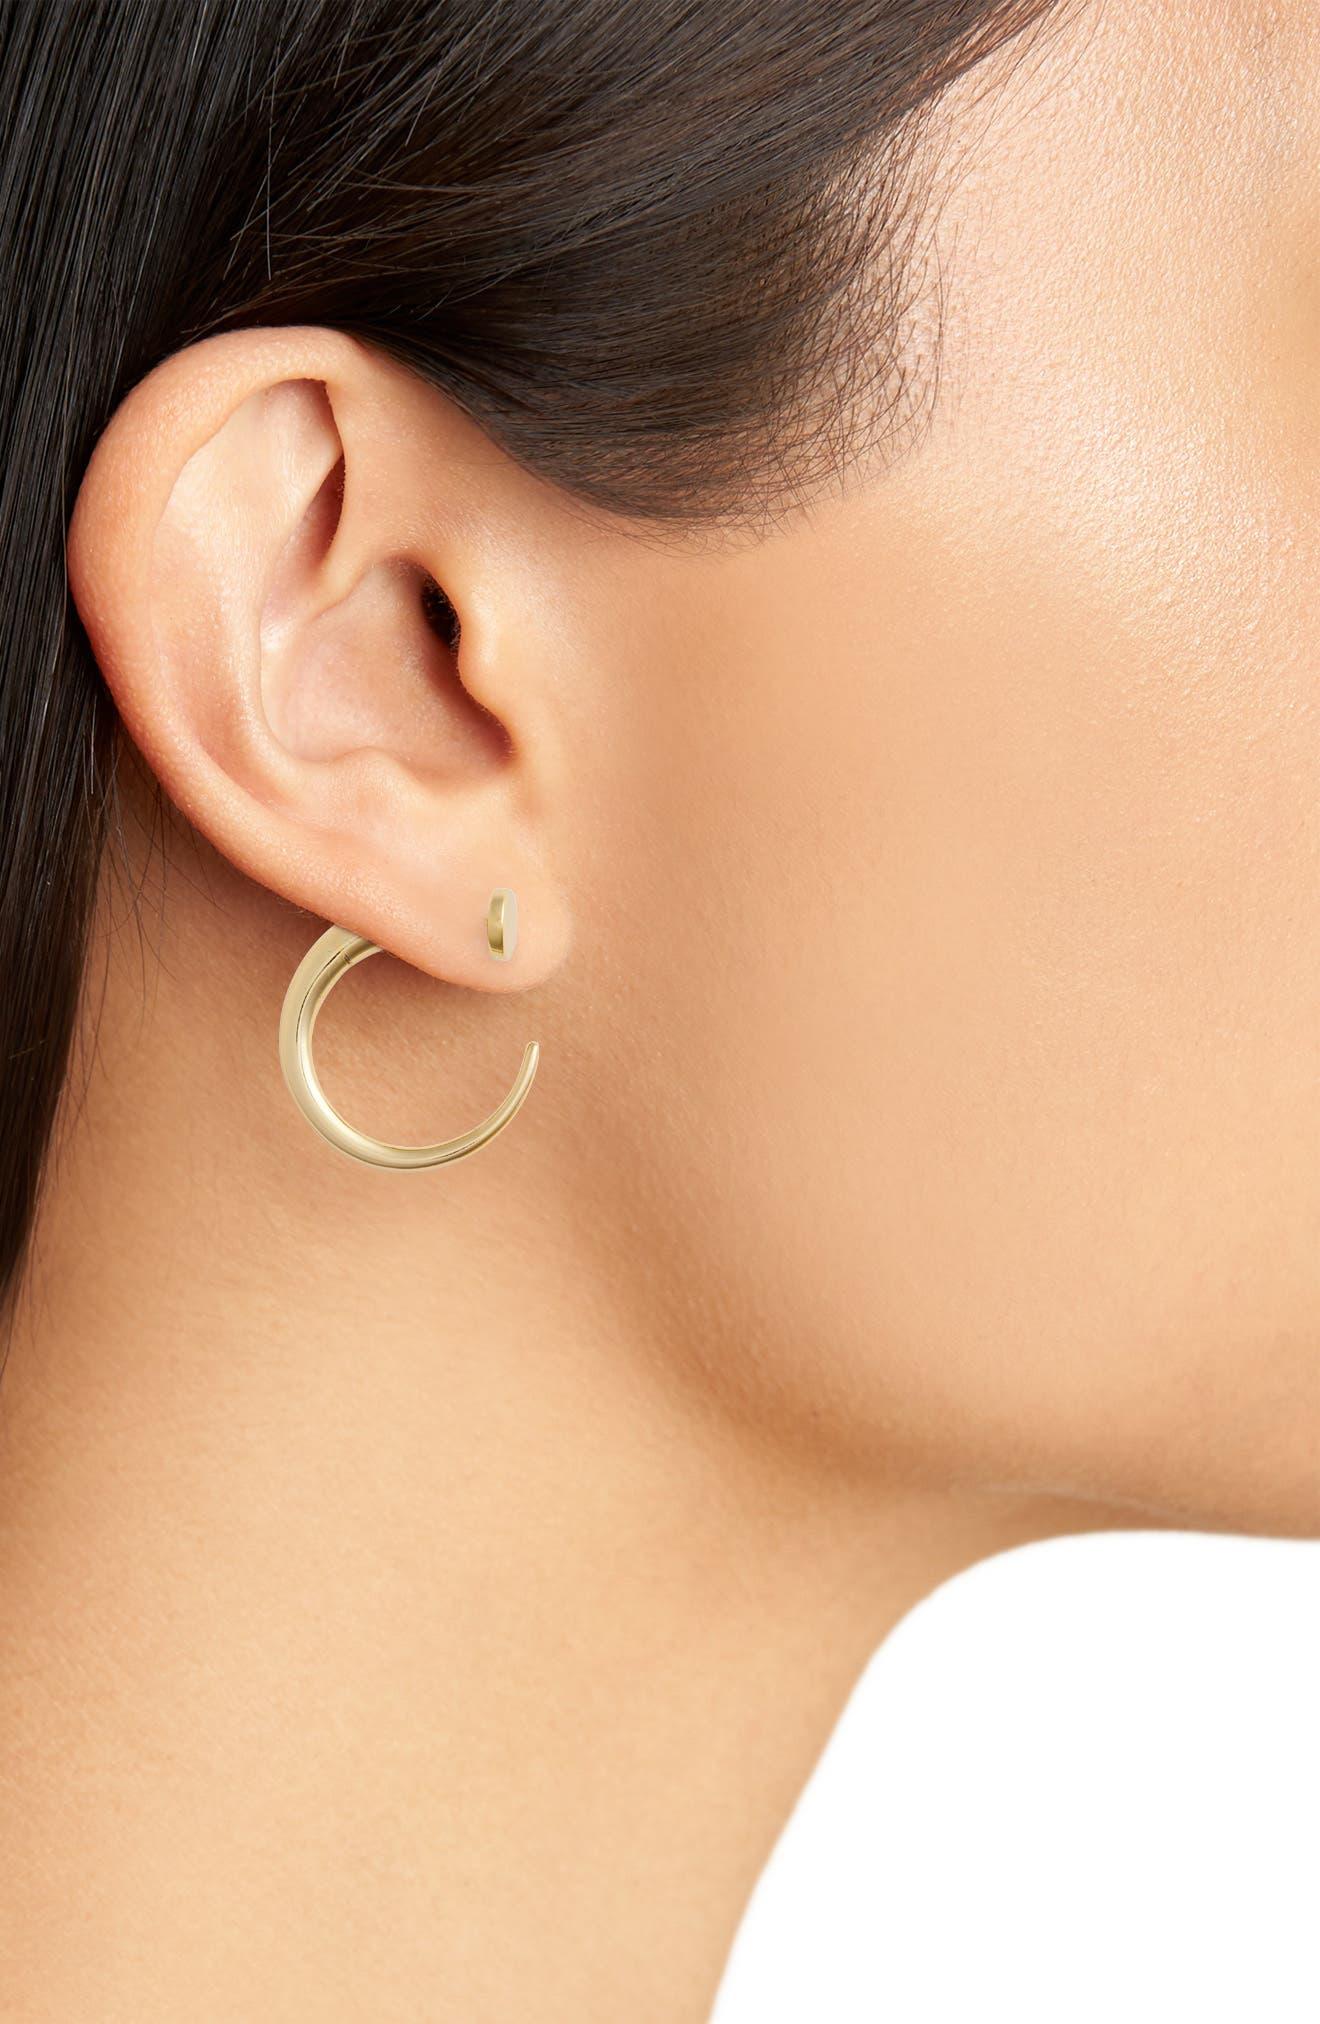 Yari Hoop Earrings,                             Alternate thumbnail 2, color,                             710